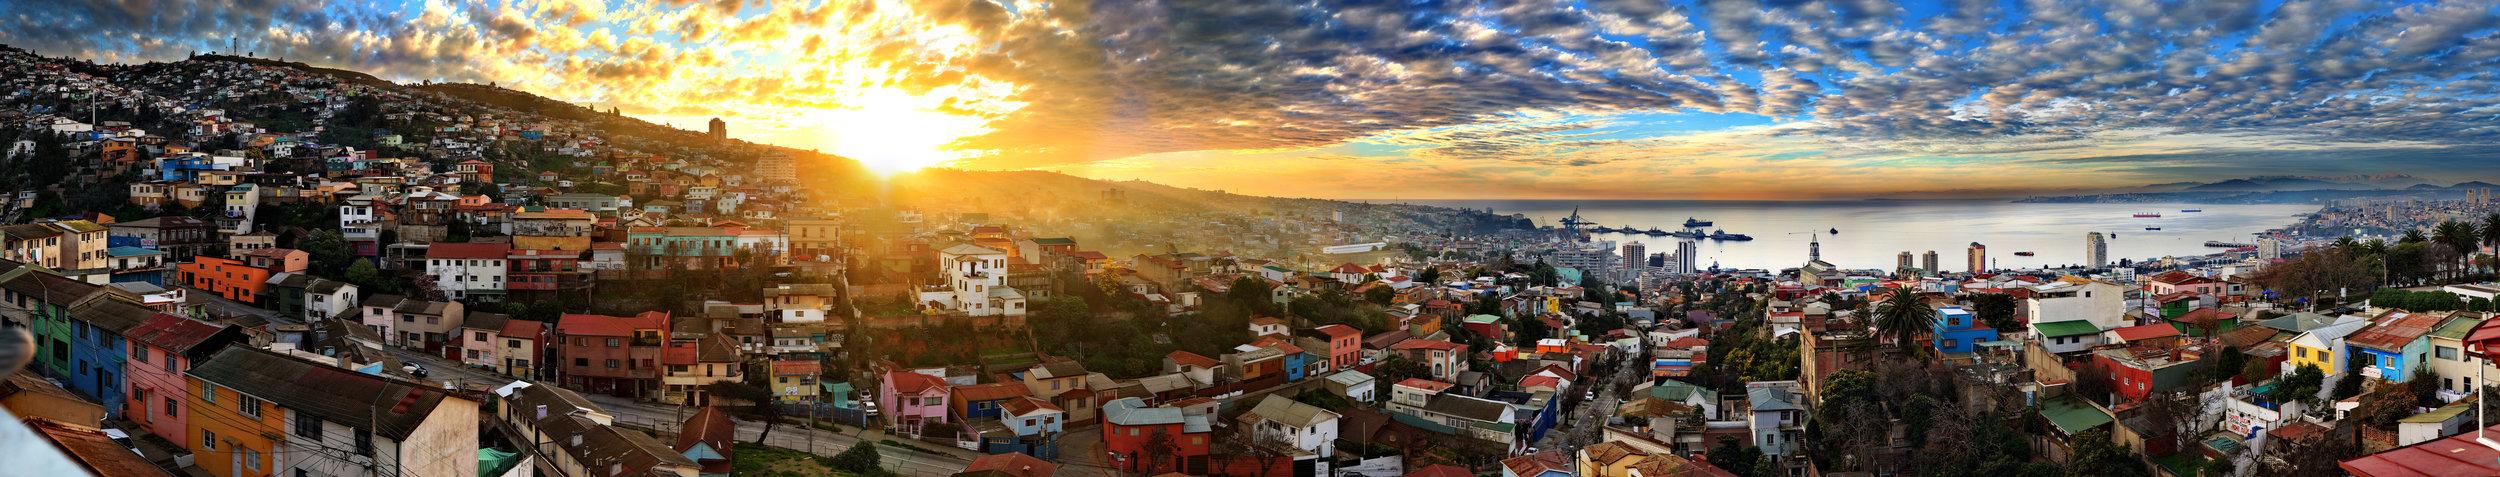 Valparaiso Chili